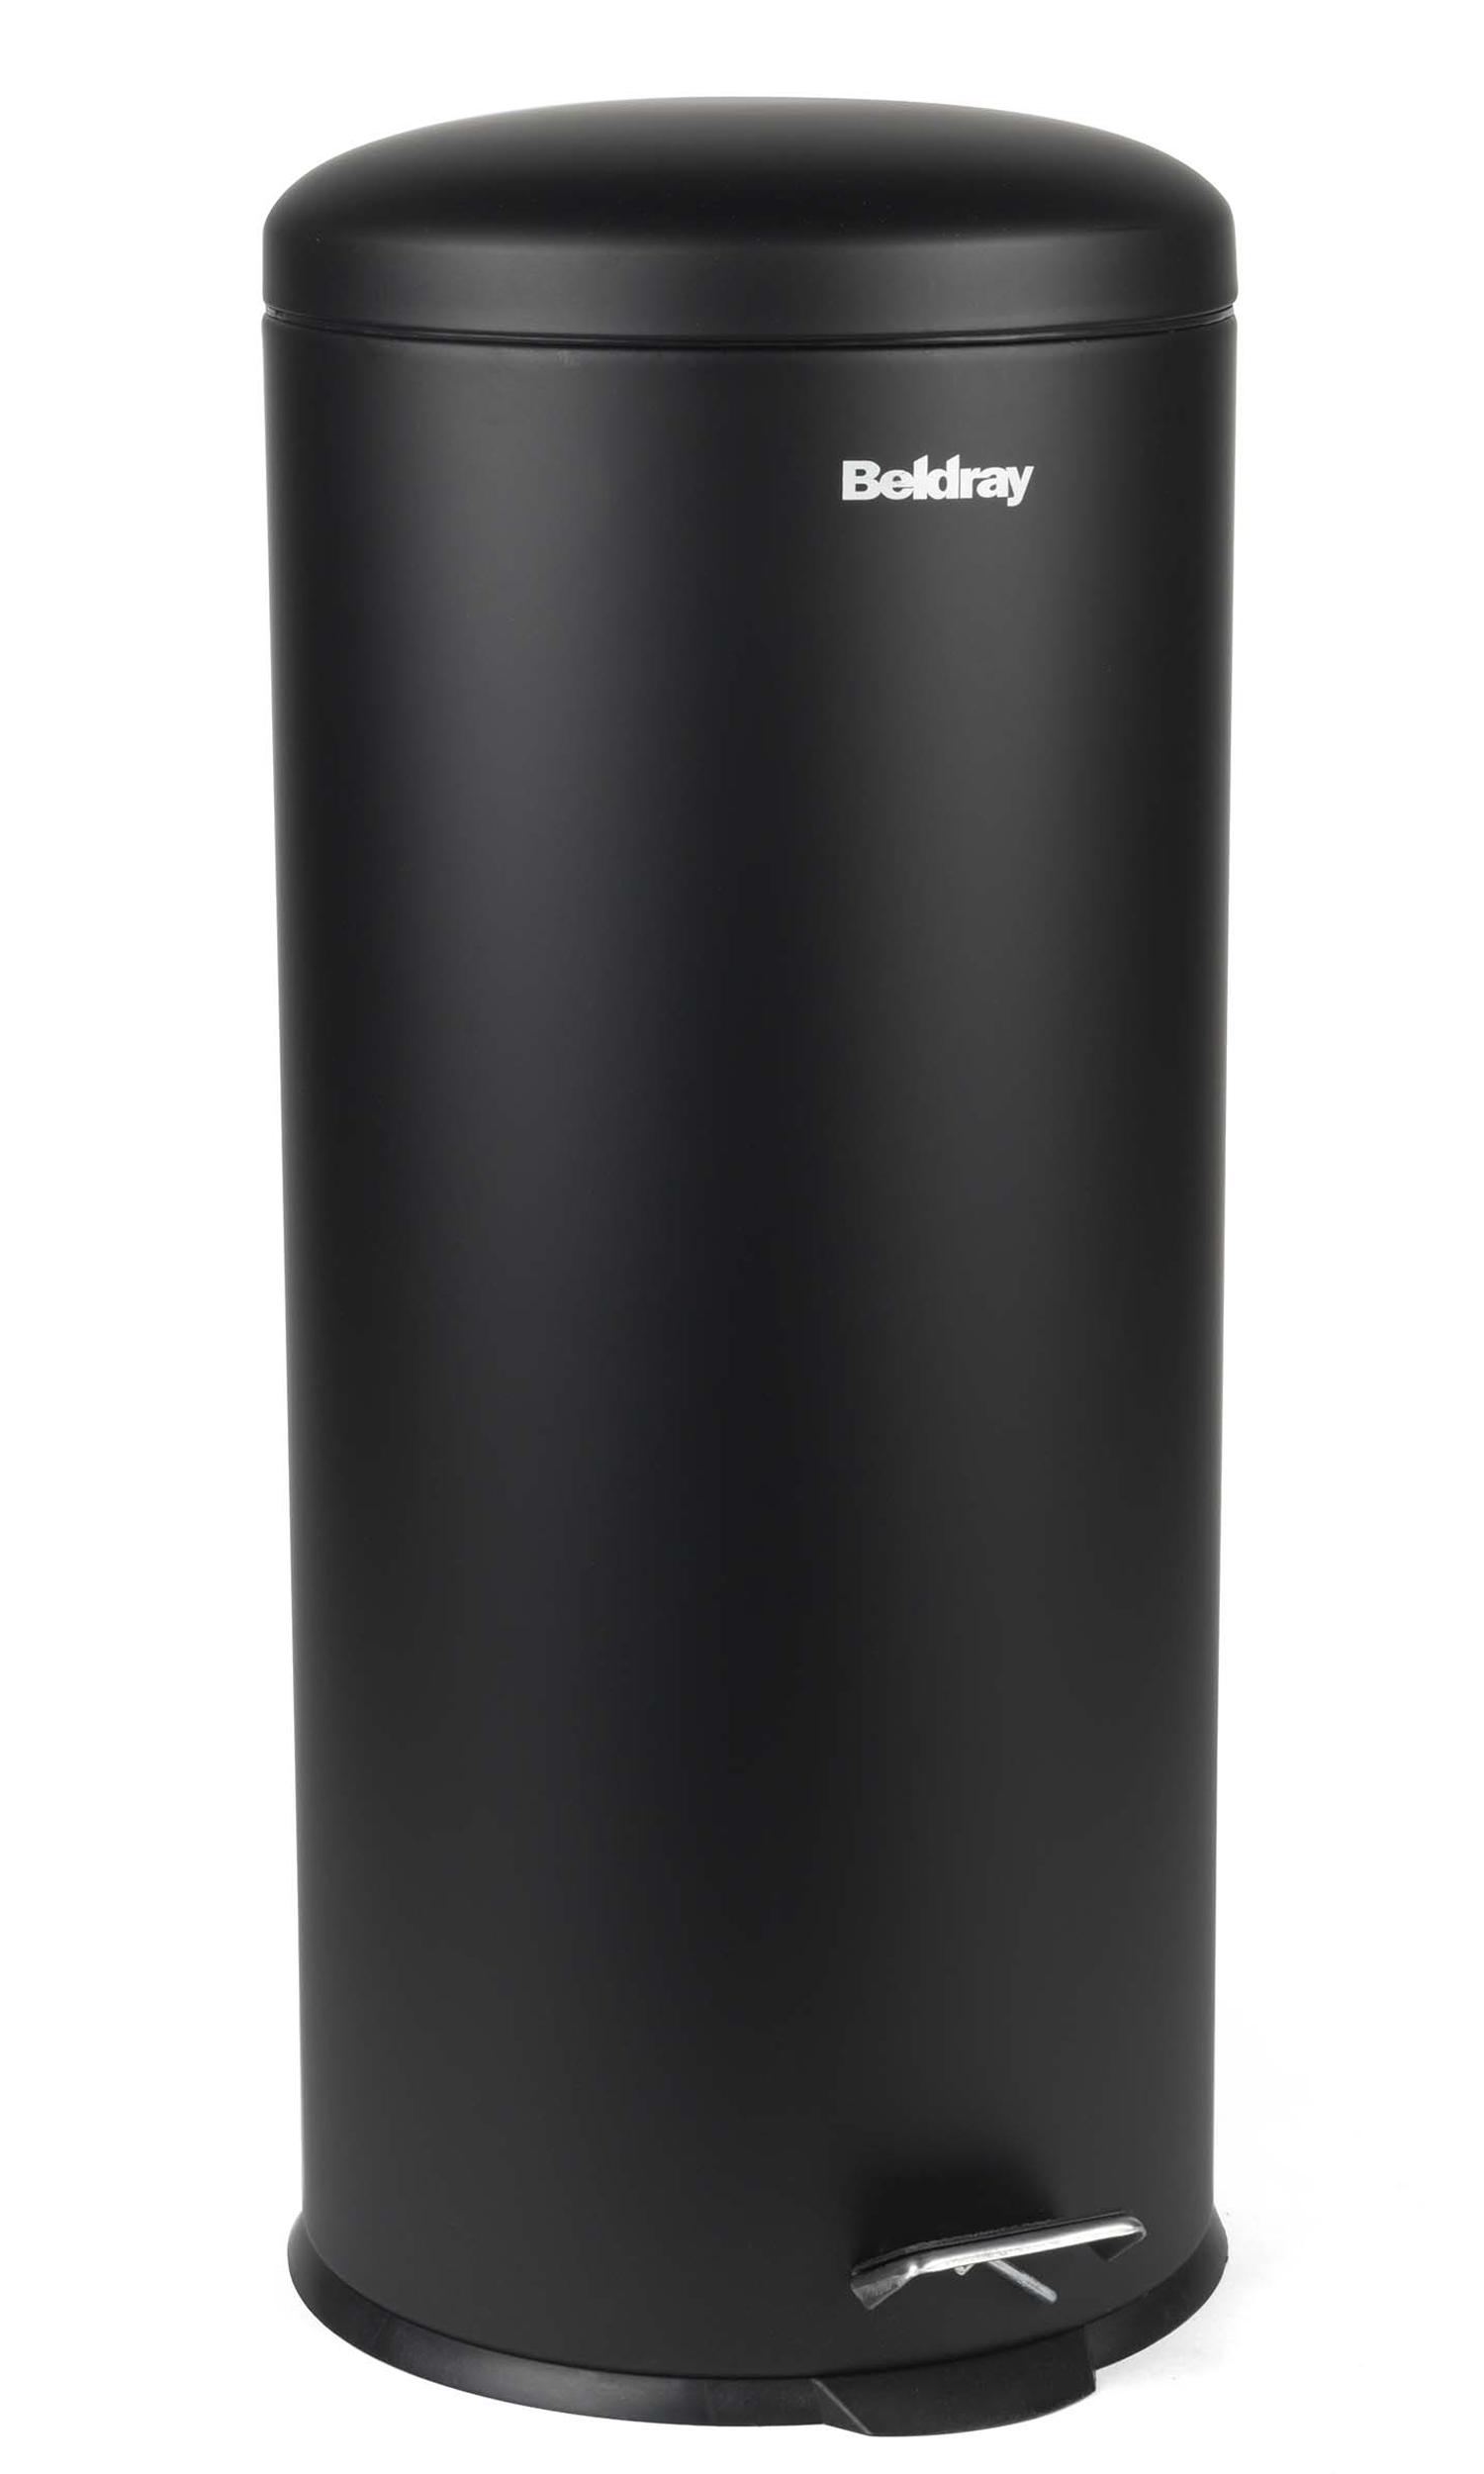 Elegant Beldray LA038074BLK 30 Litre Black Kitchen Bin With Soft Closing Lid